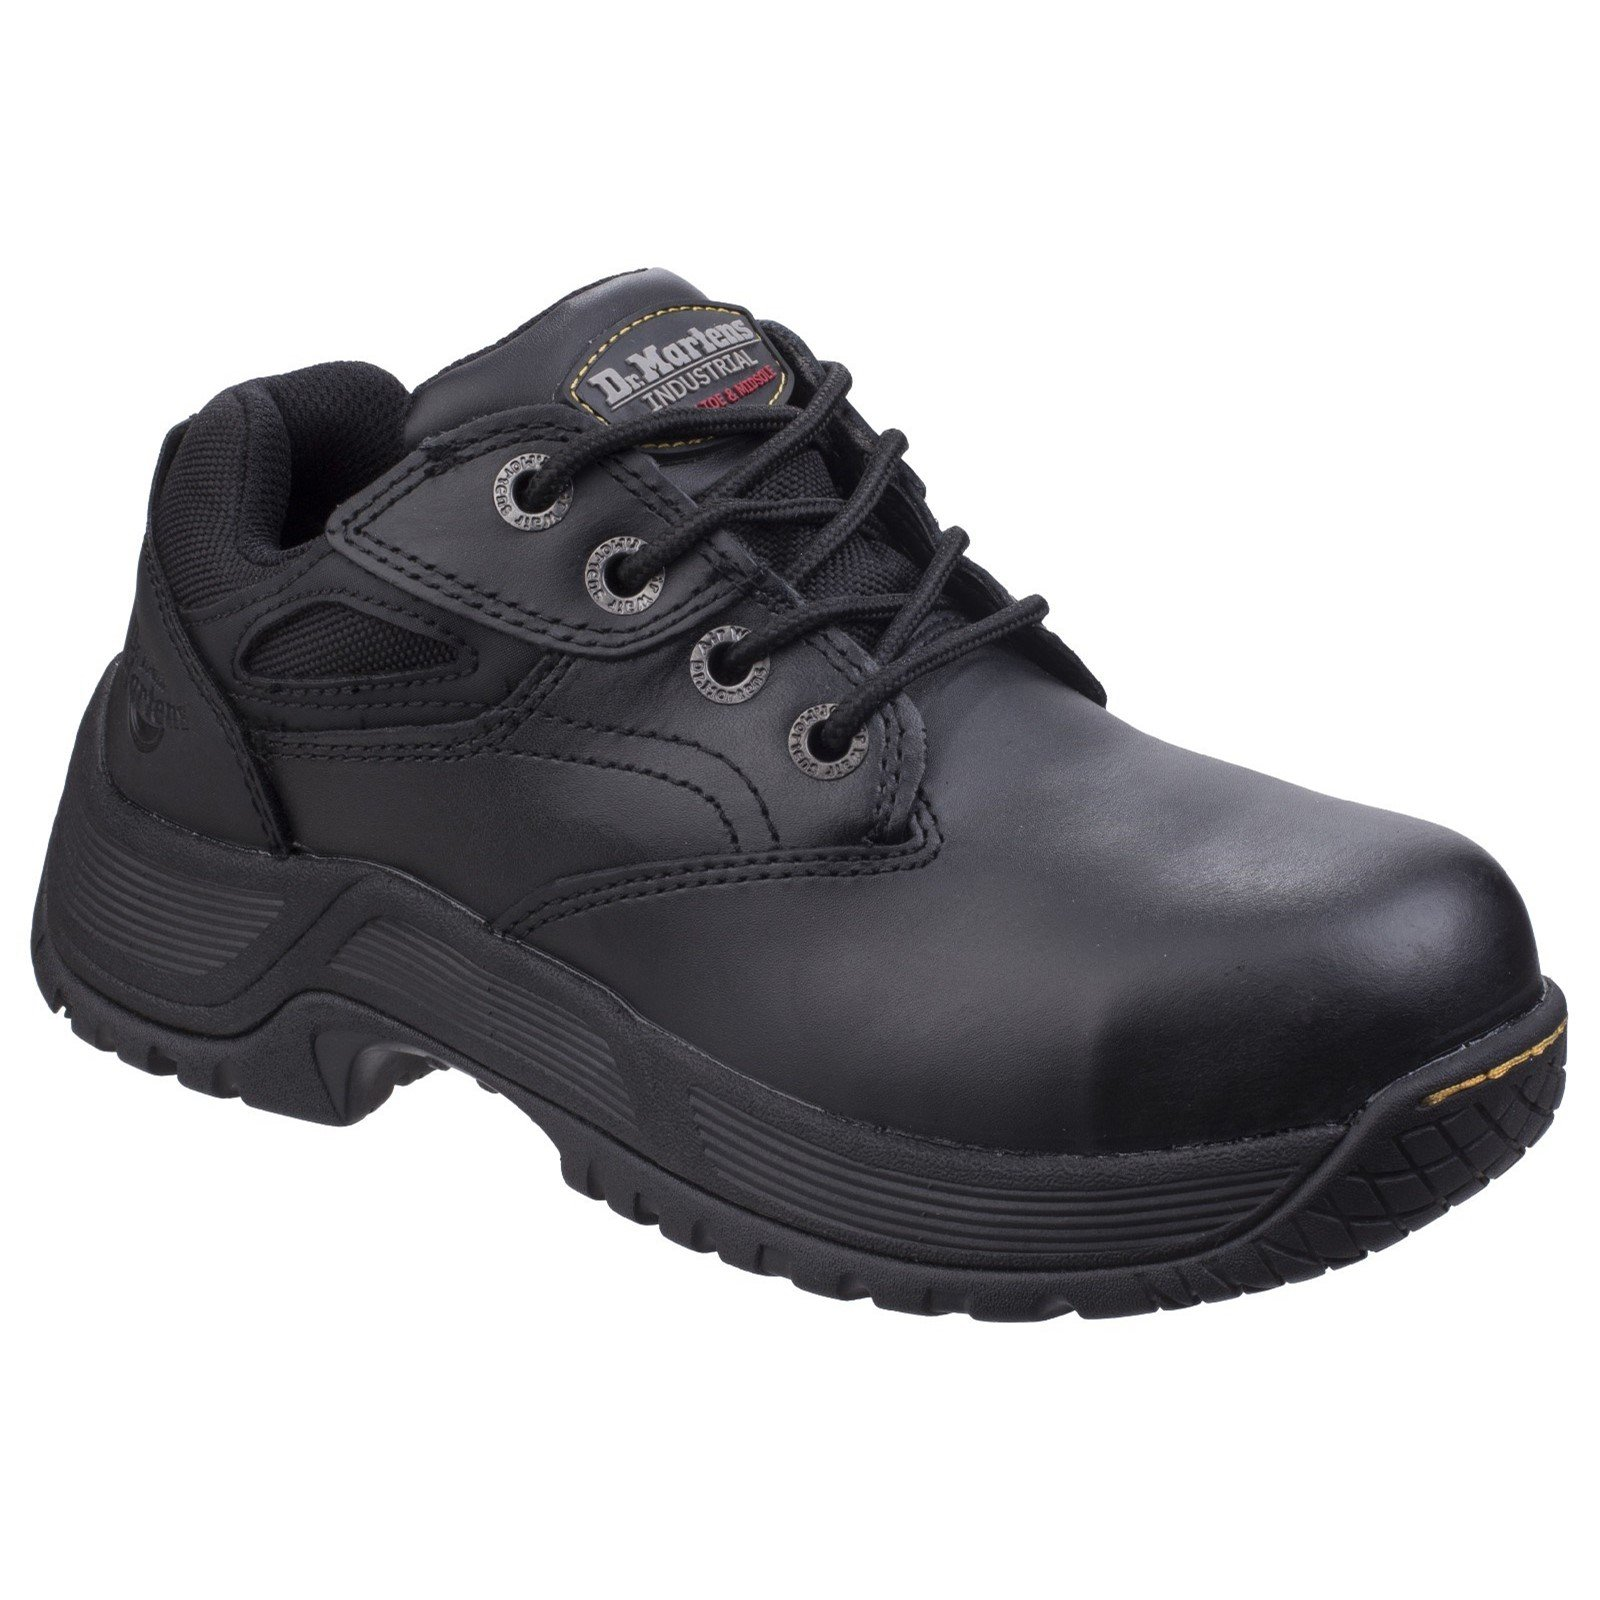 Dr Martens Unisex Calvert Steel Toe Safety Trainer Black 26022 - Black 4